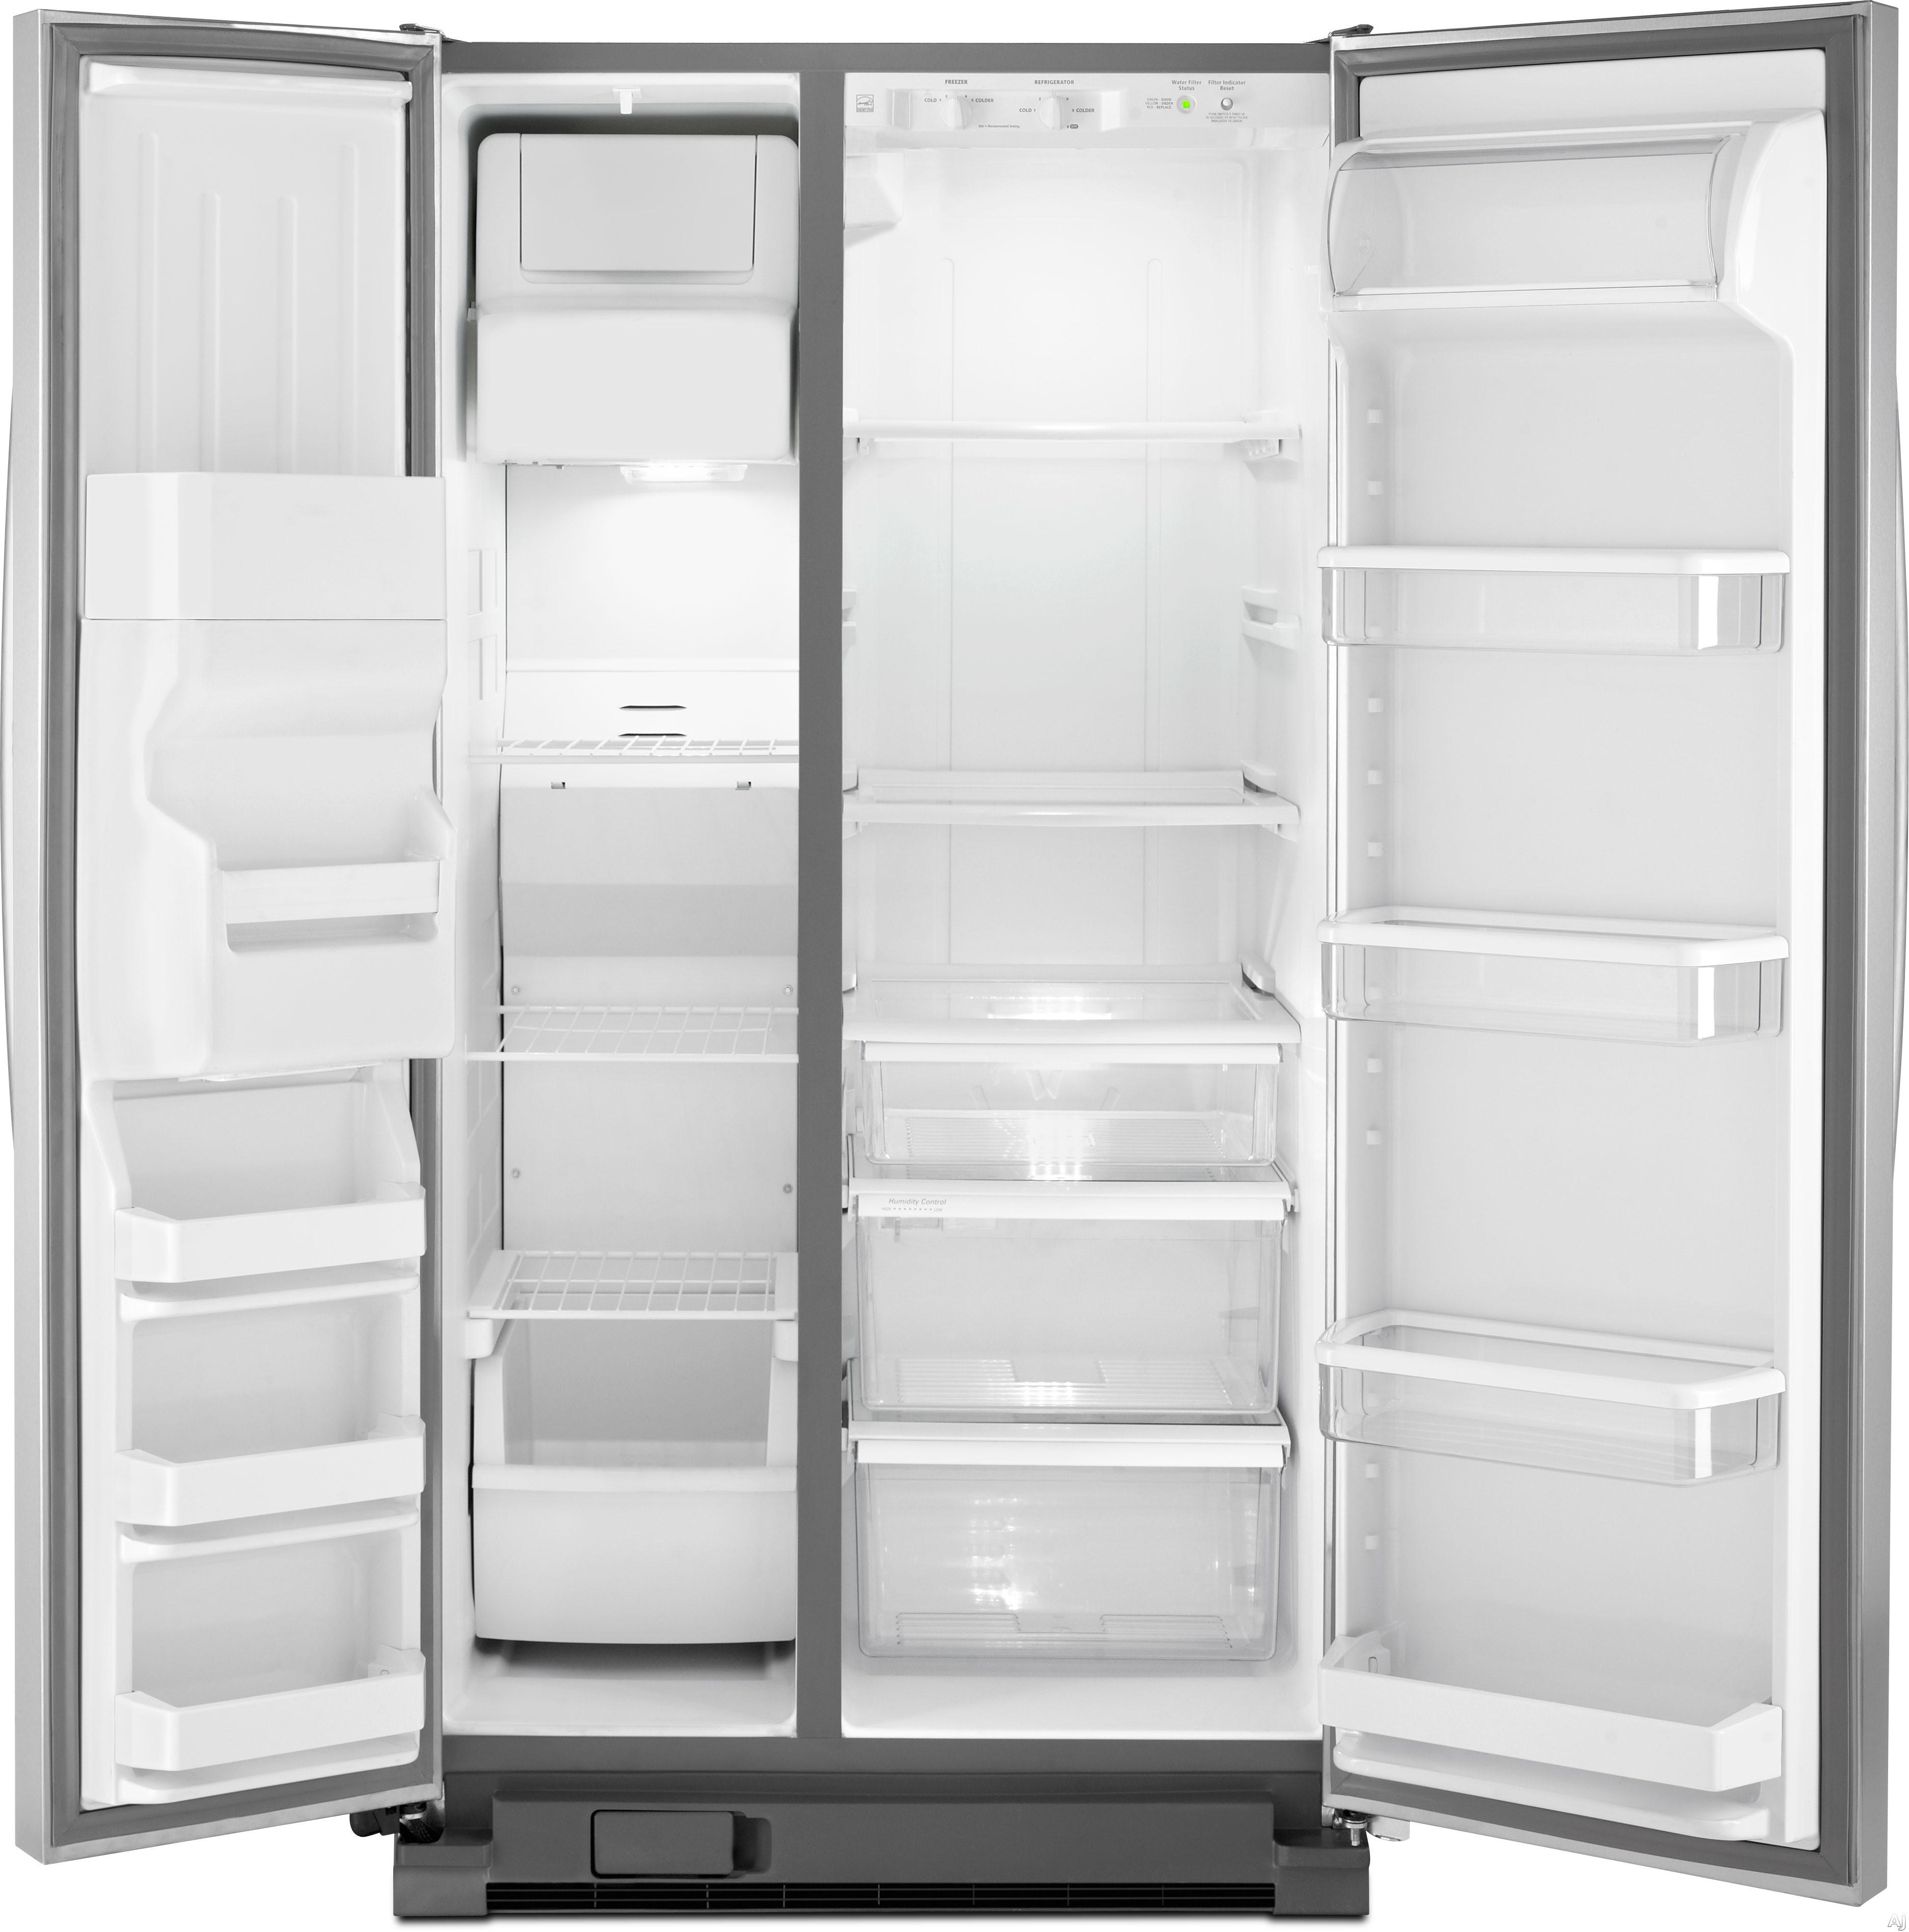 whirlpool wrs325fda 25 4 cu ft side by side refrigerator. Black Bedroom Furniture Sets. Home Design Ideas